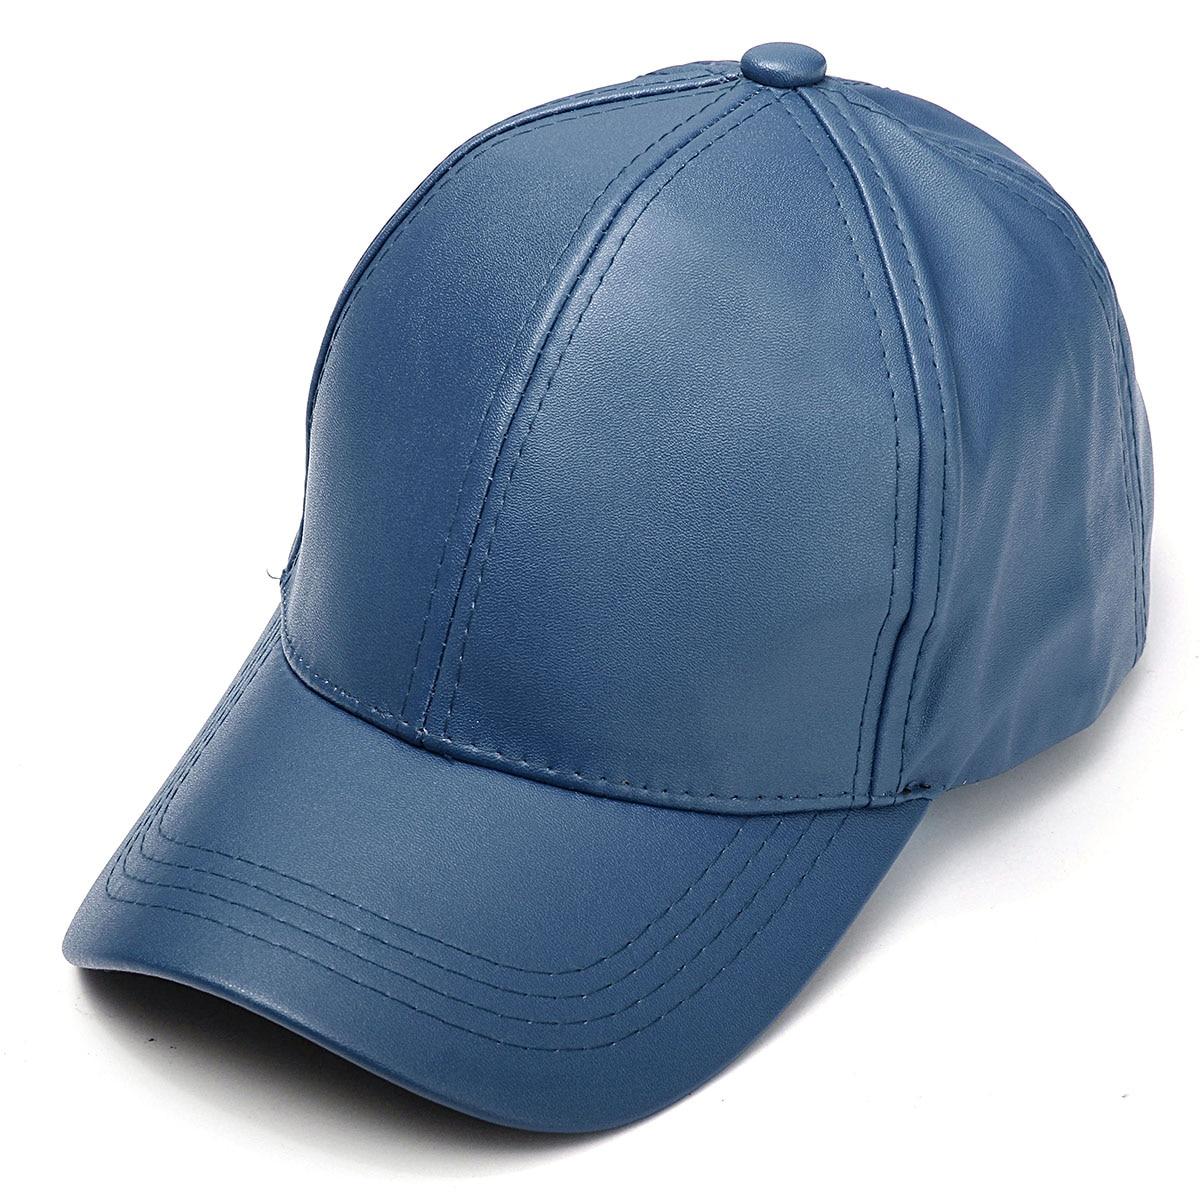 Trucker Hats Baseball-Cap Snapback Sun-Hat Bone-Casquette Adjustable Unisex Women Gorras